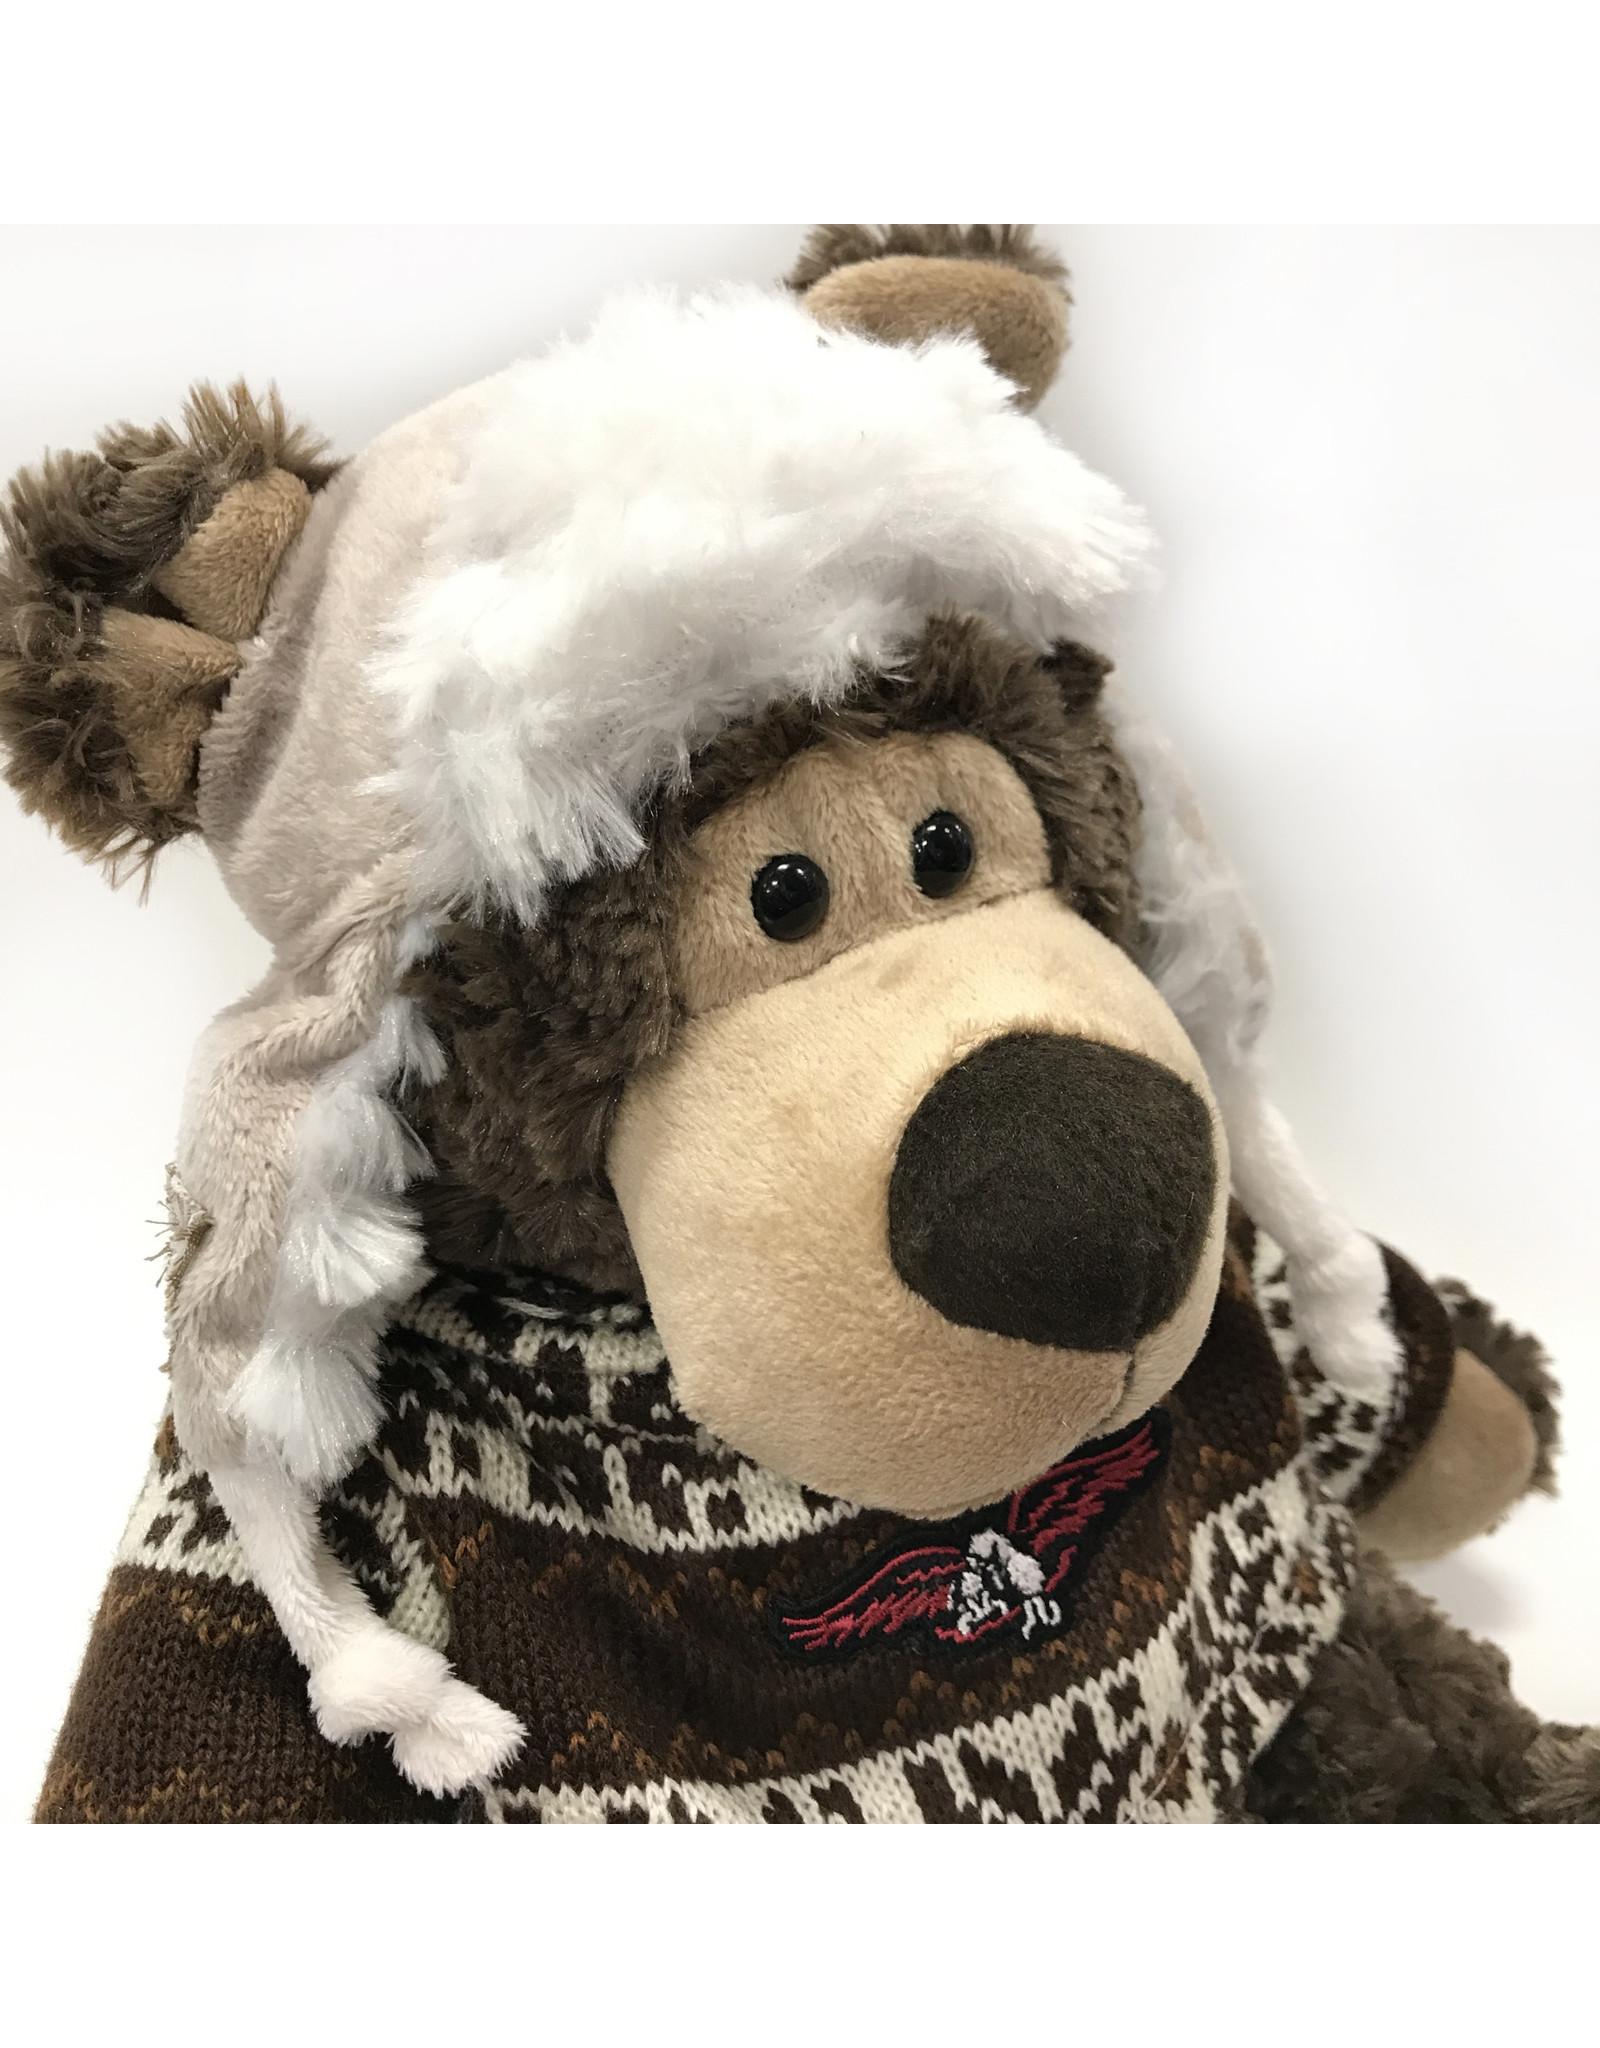 Mascot Factory PLUSH BEAR - NORDIC 10